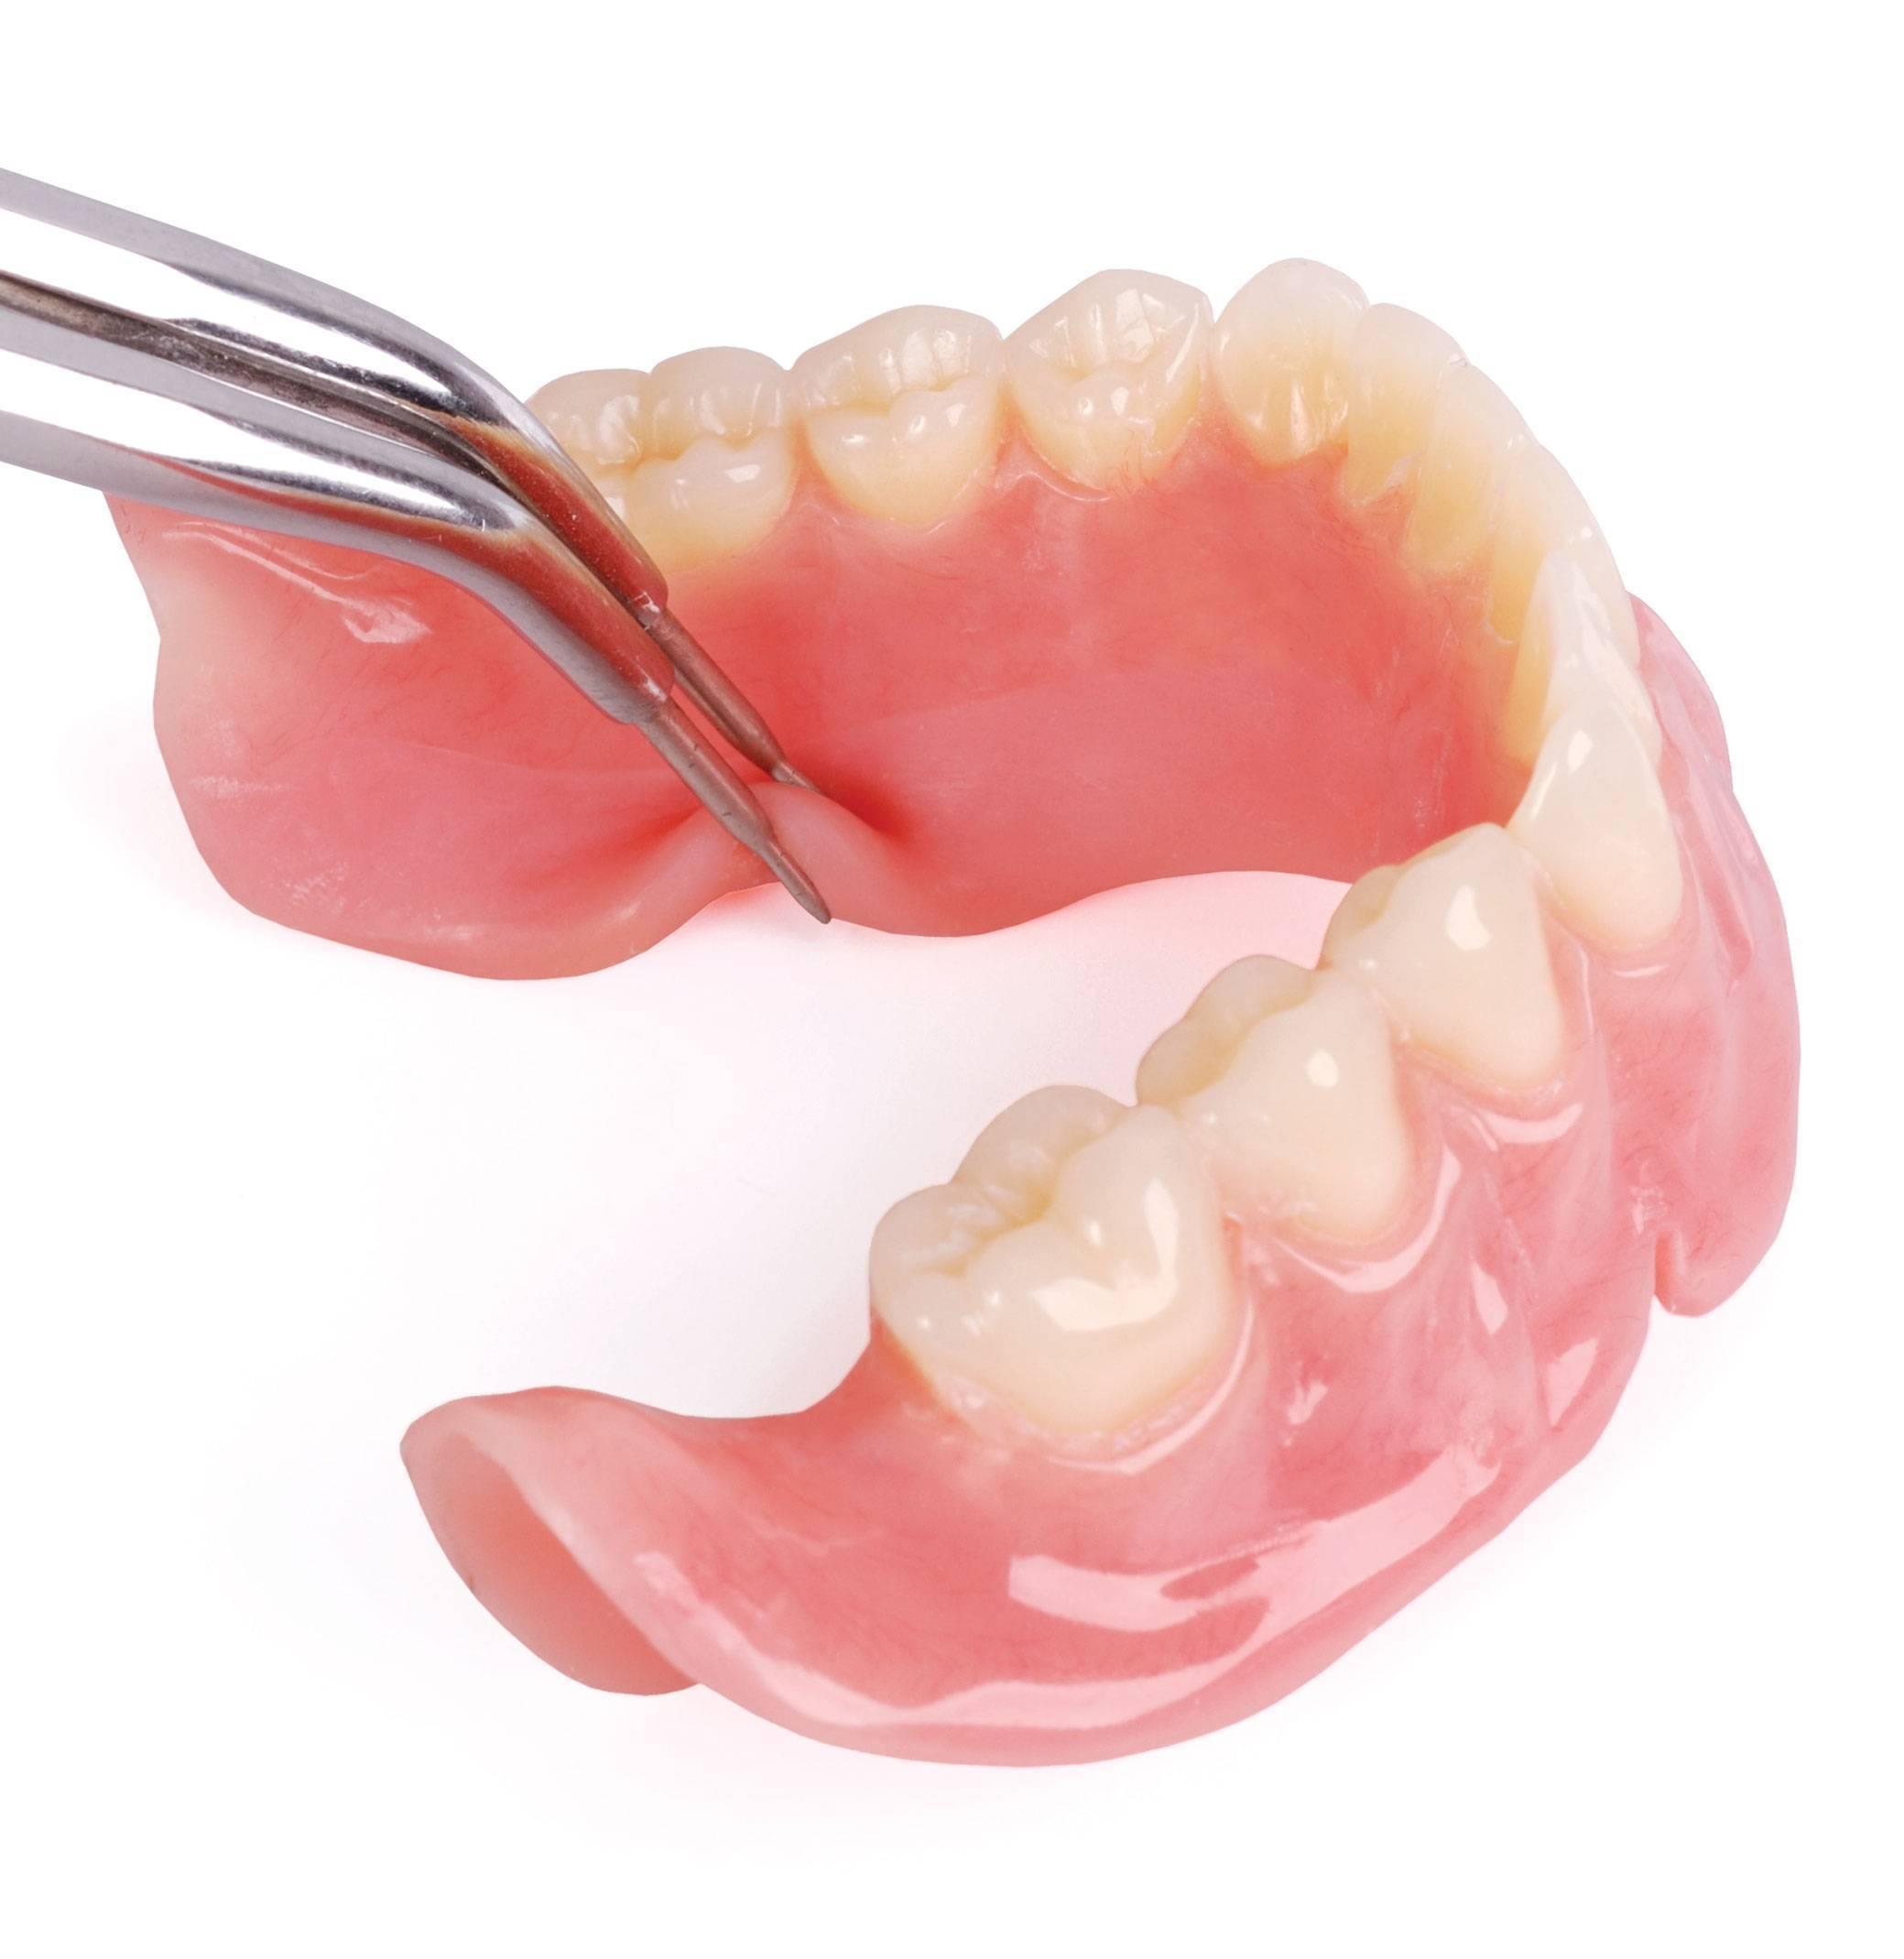 протез зуба